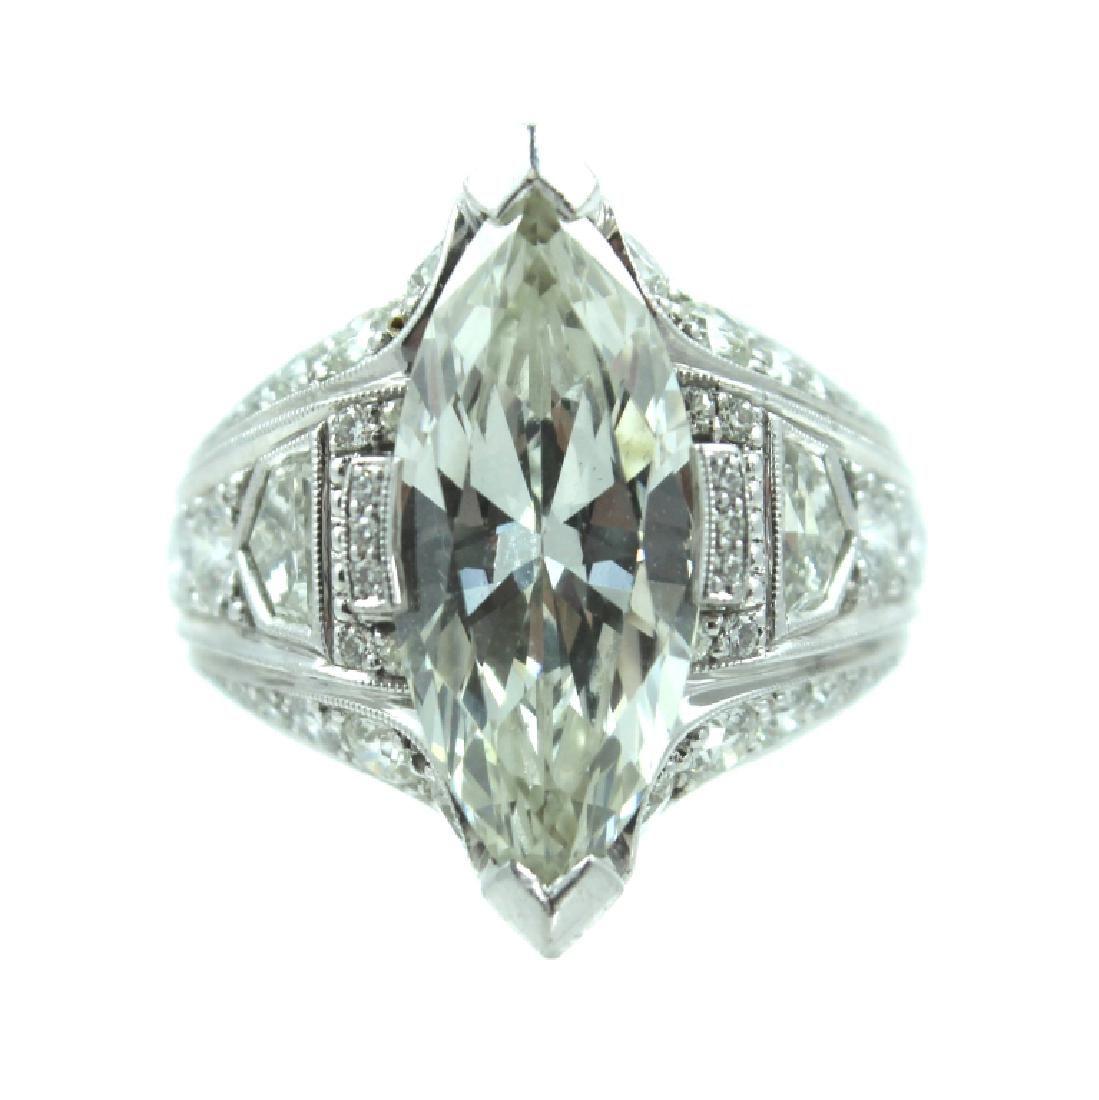 ESTATE 7.50 TCW MARQUISE DIAMOND ENGAGEMENT RING